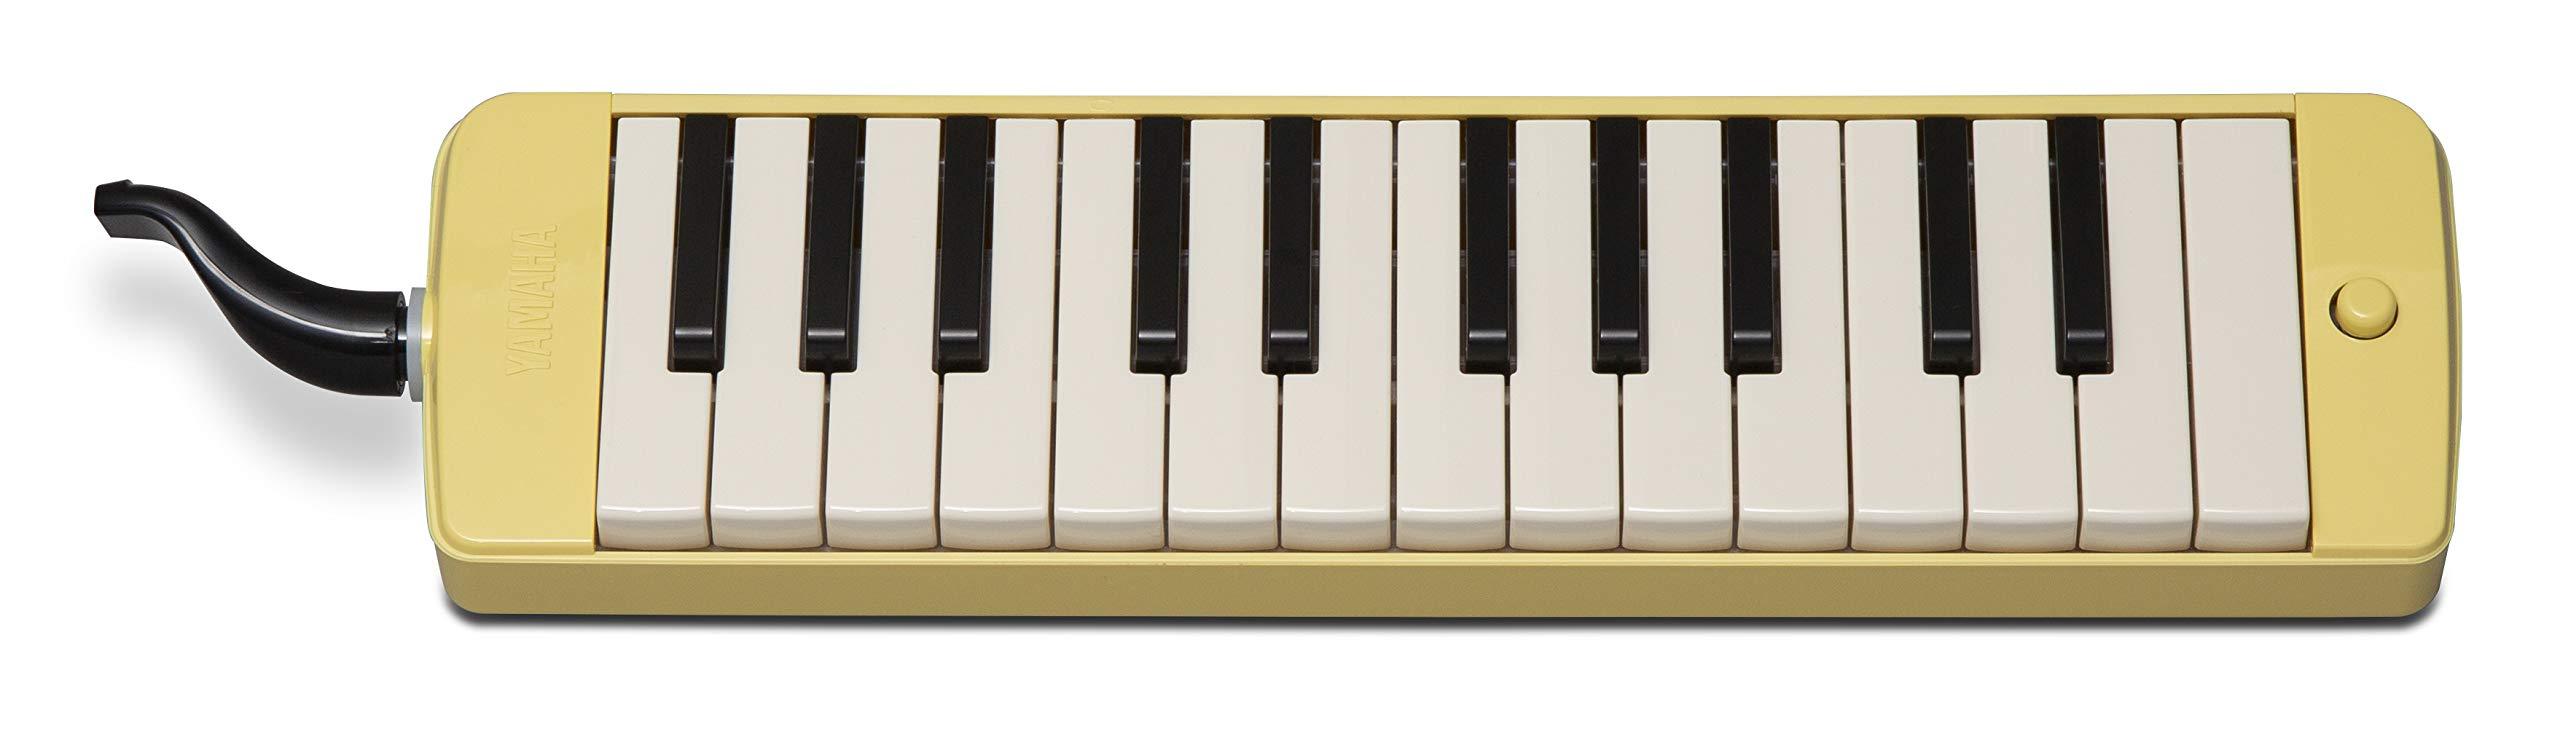 Yamaha, 25-Key Melodica, 25 keys (P25F) by YAMAHA